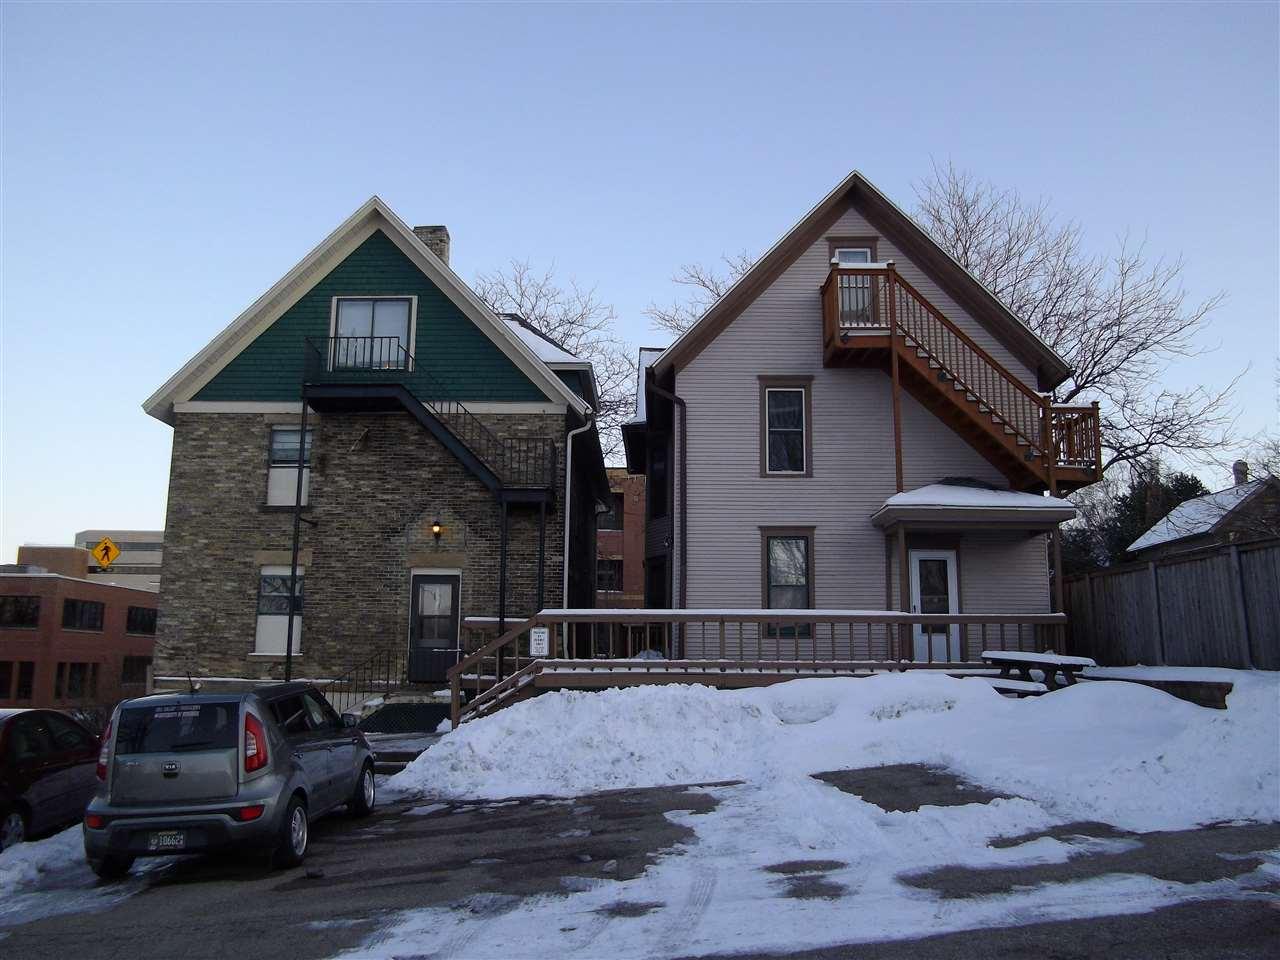 522 & 524 East Main St, Madison, WI 53703